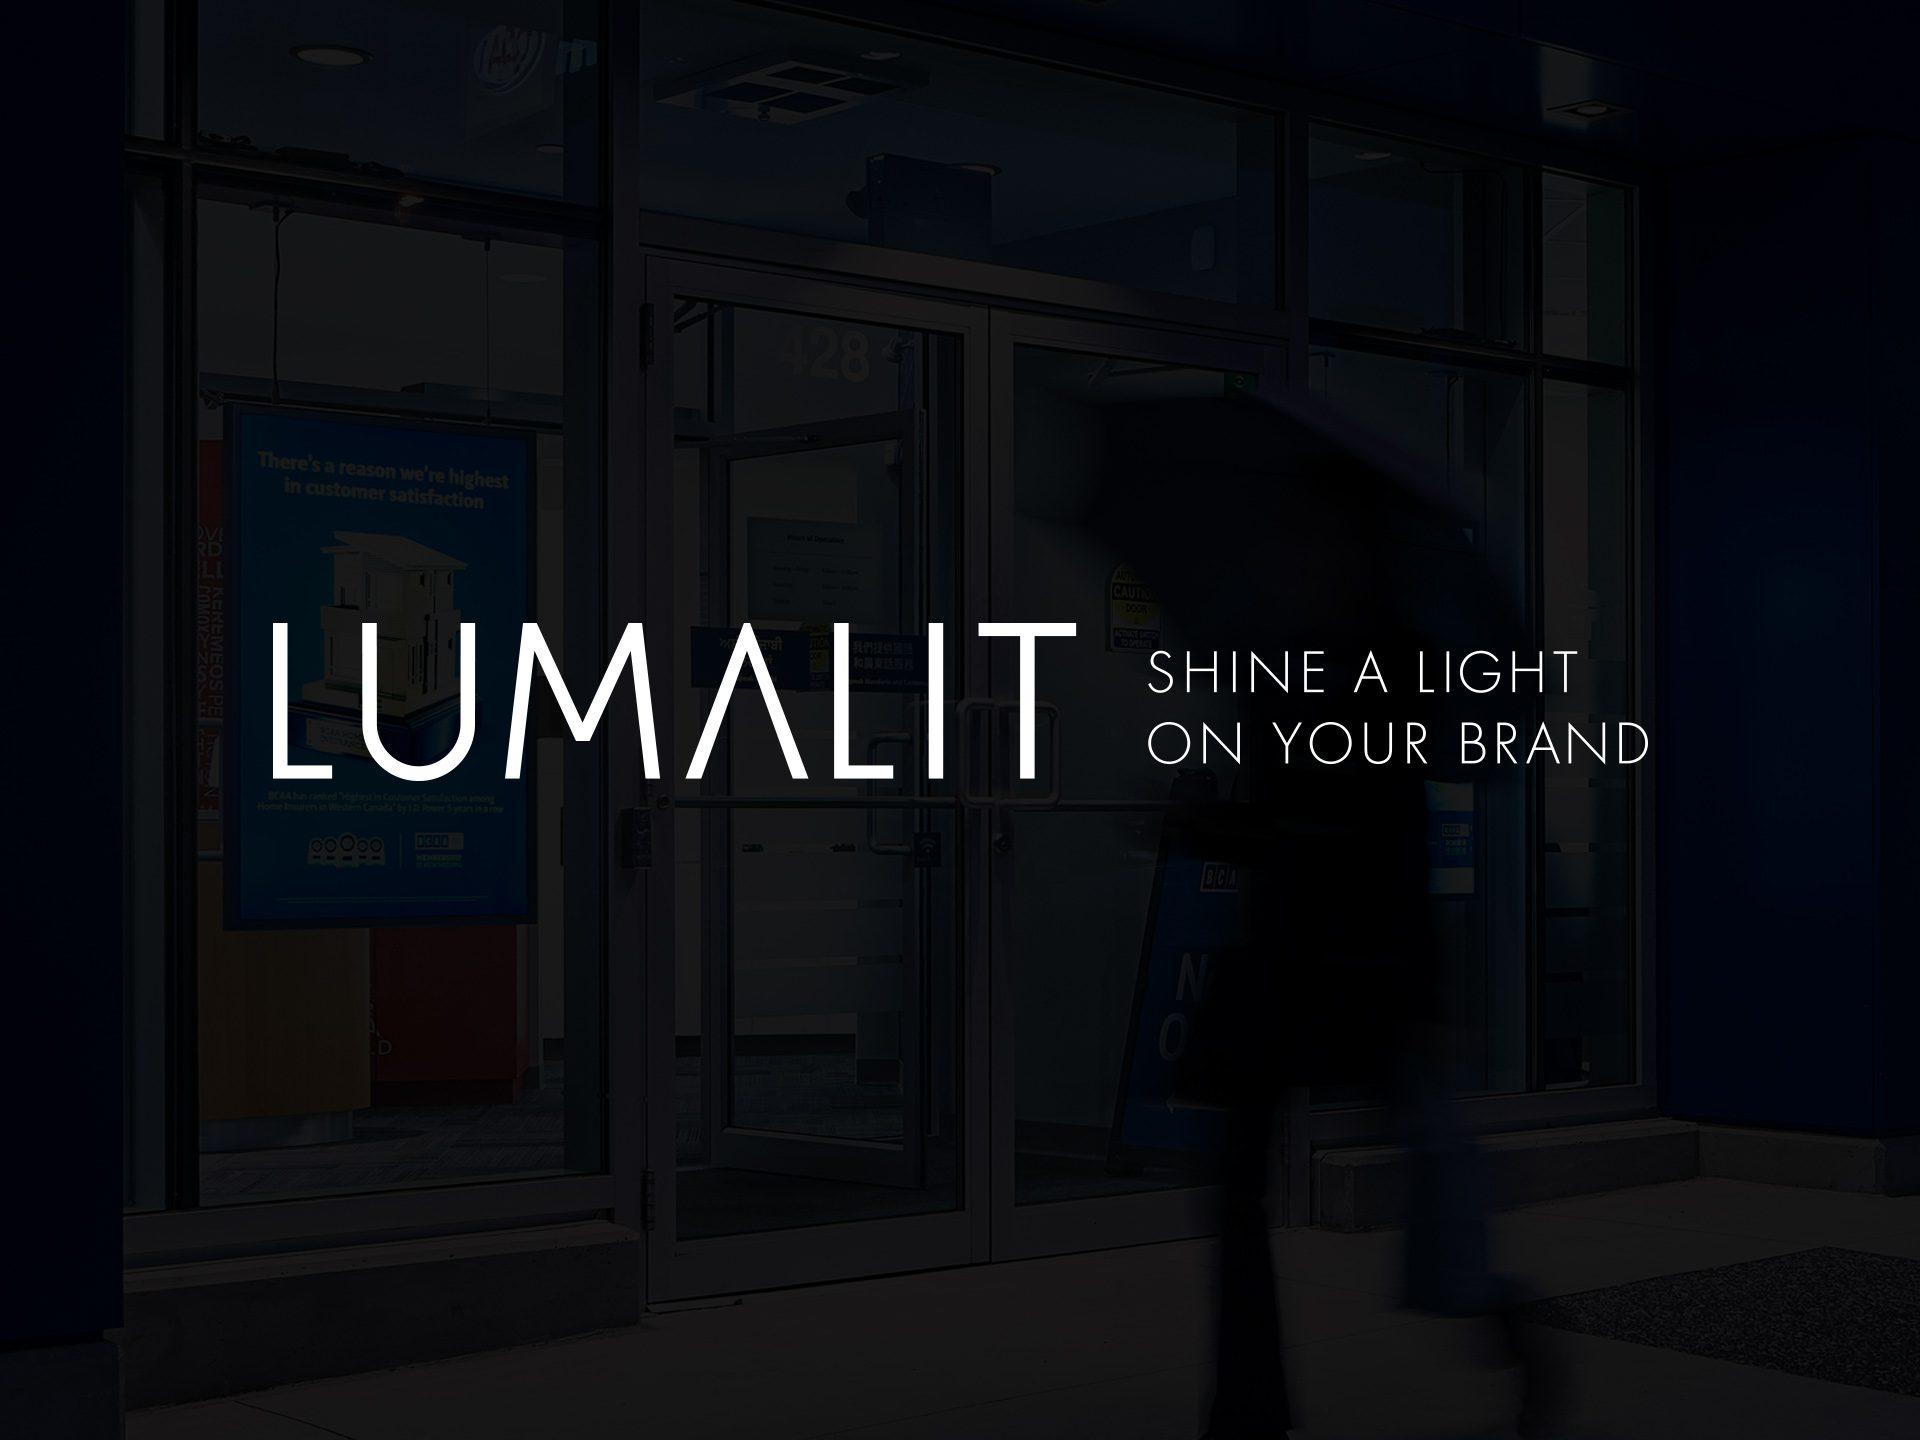 Y5 Creative Case Studies Product Branding Peregrine Retail Design Manufacturing Lumalit 1